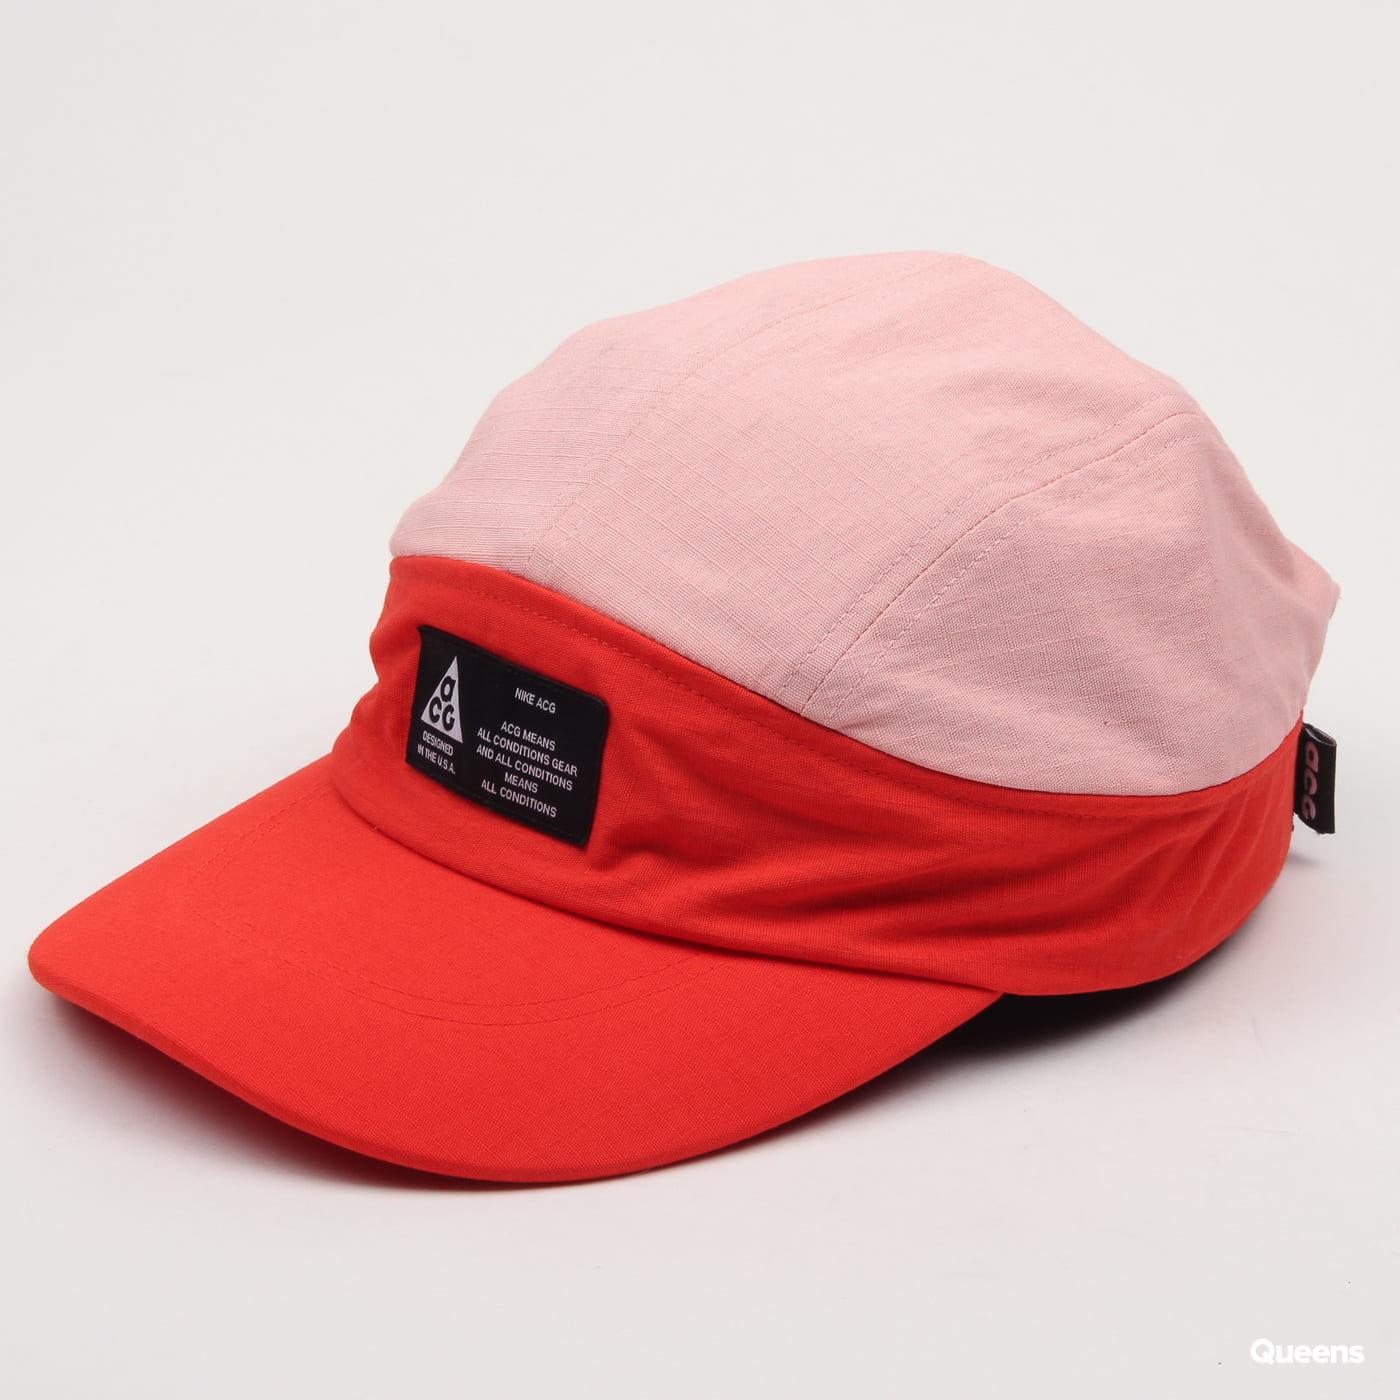 competitive price a4bd3 5d949 Hat Nike U NRG Tailwind Visor Cap ACG (BV1049-634)– Queens 💚